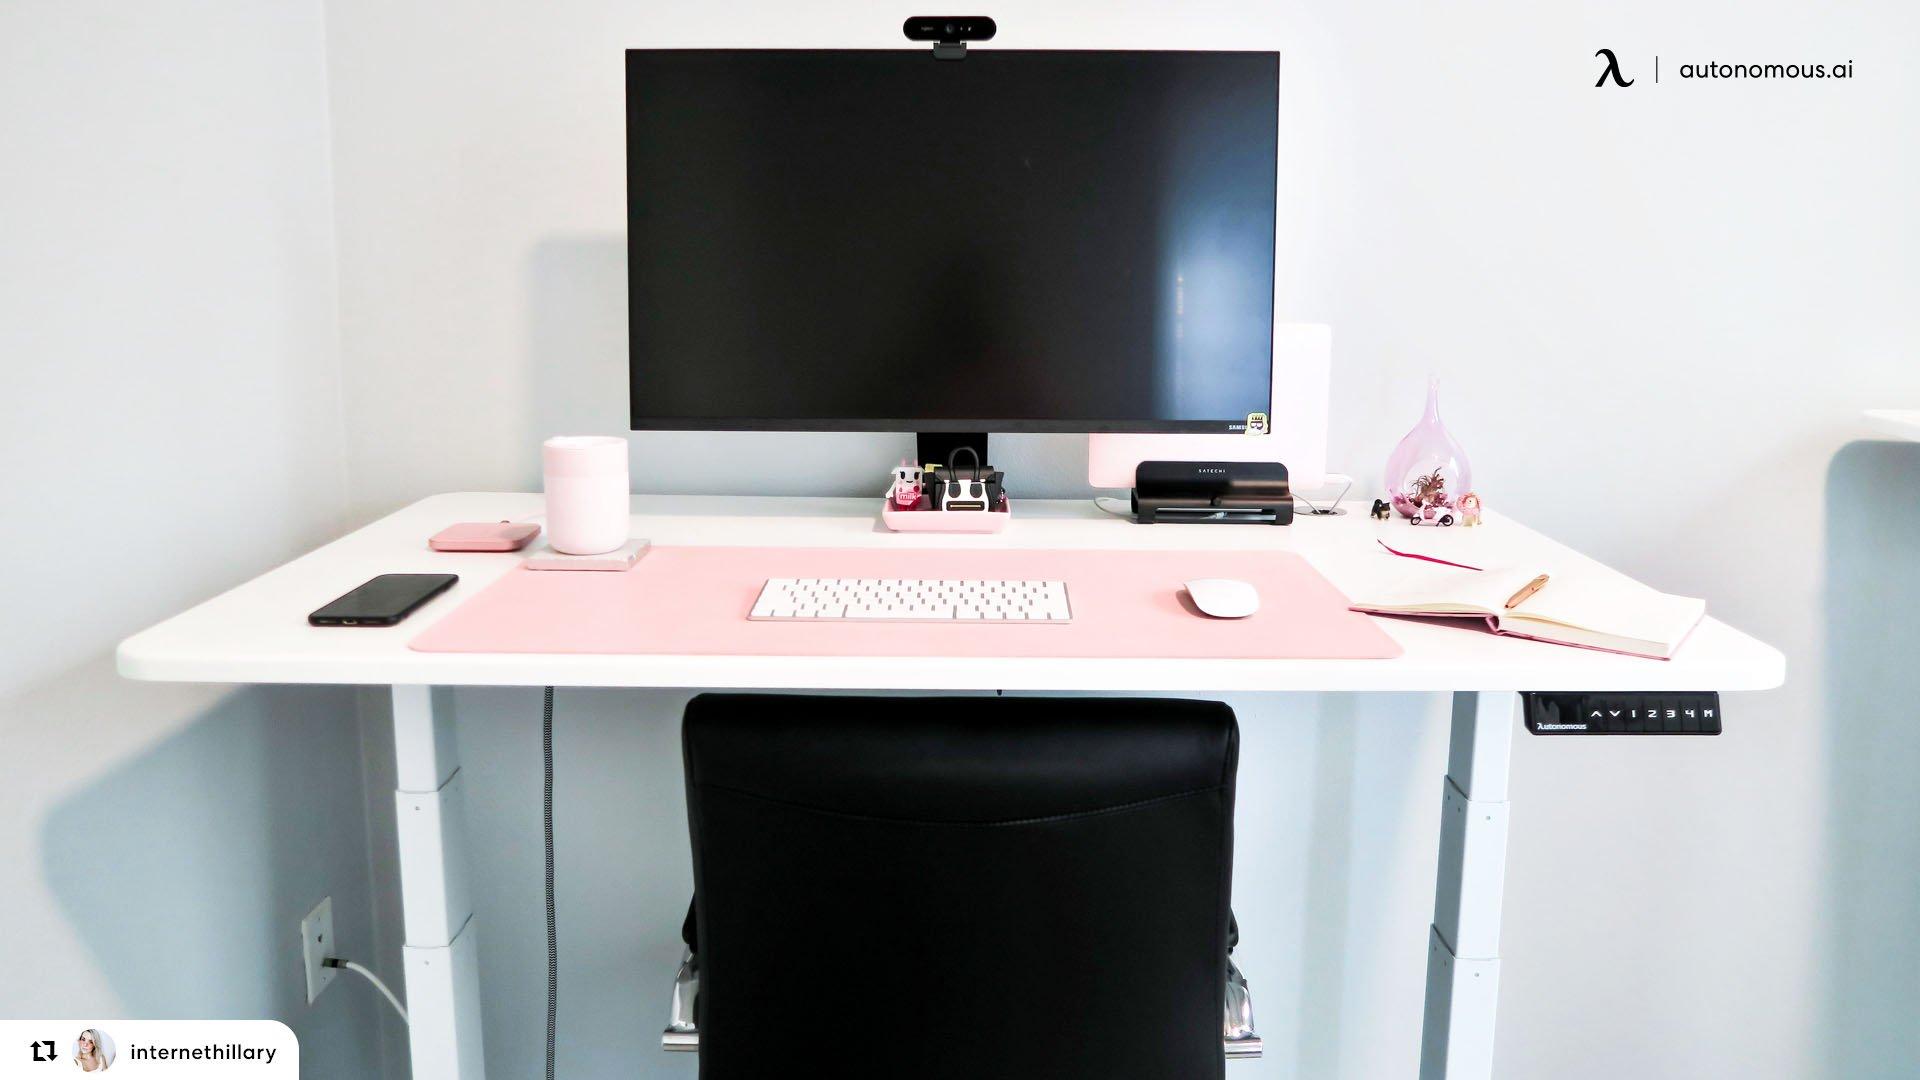 SmartDesk 2 Home Office and Premium